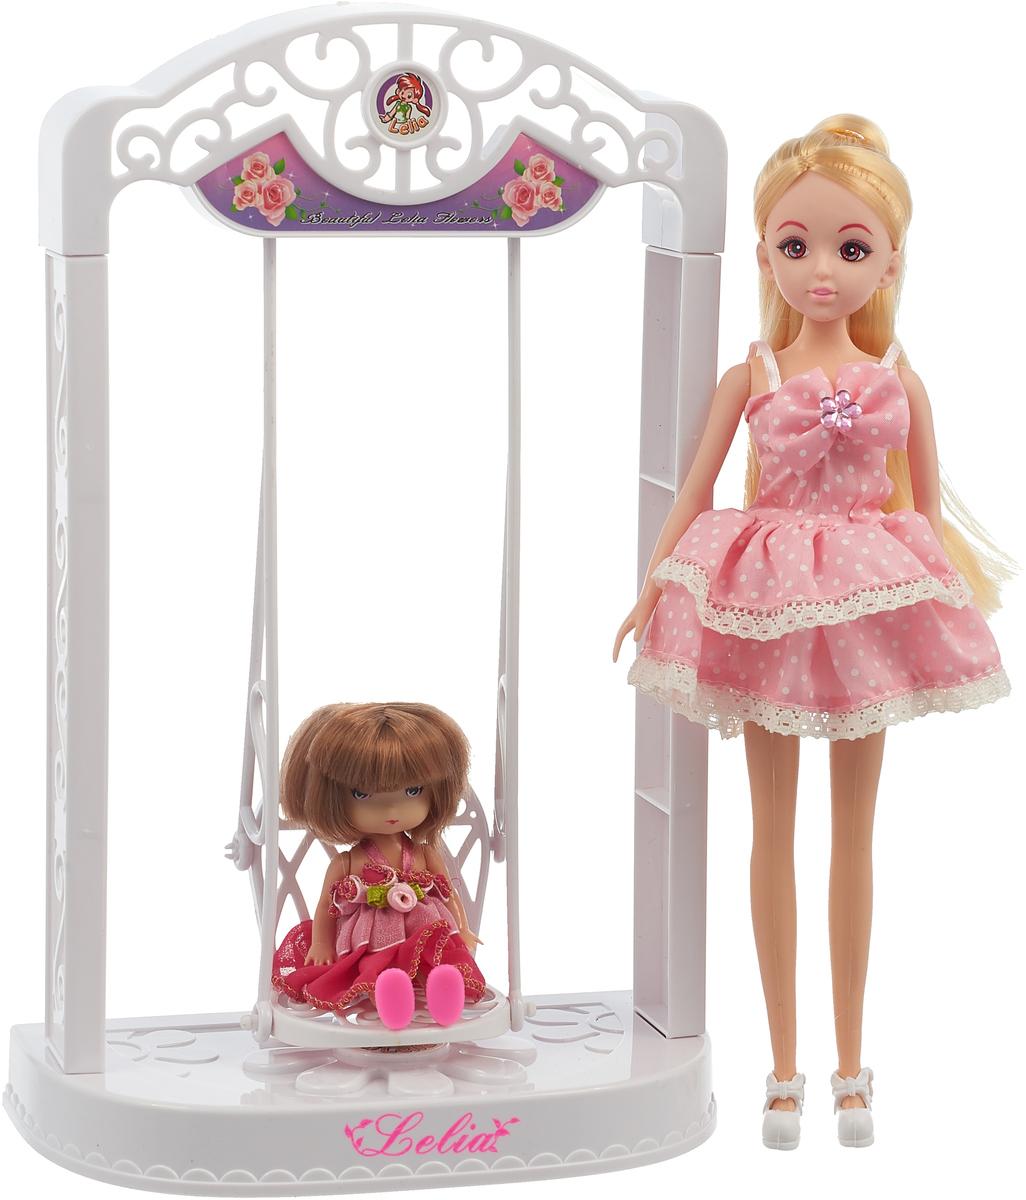 Bradex Кукла Лелия с качелями кукла yako m6579 6